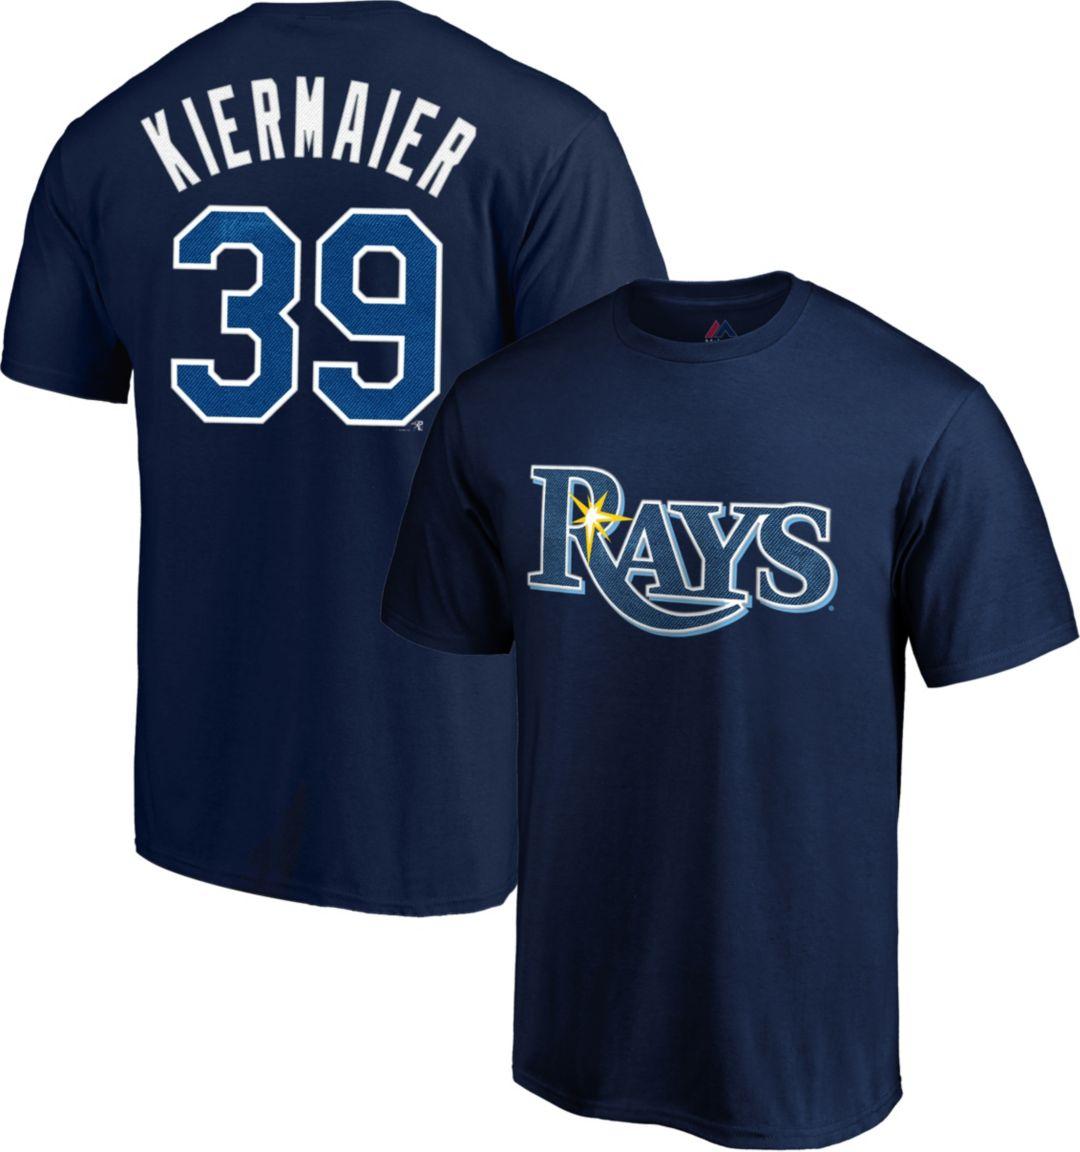 timeless design fcb4d ca13c Majestic Men's Tampa Bay Rays Kevin Kiermaier #36 Navy T-Shirt